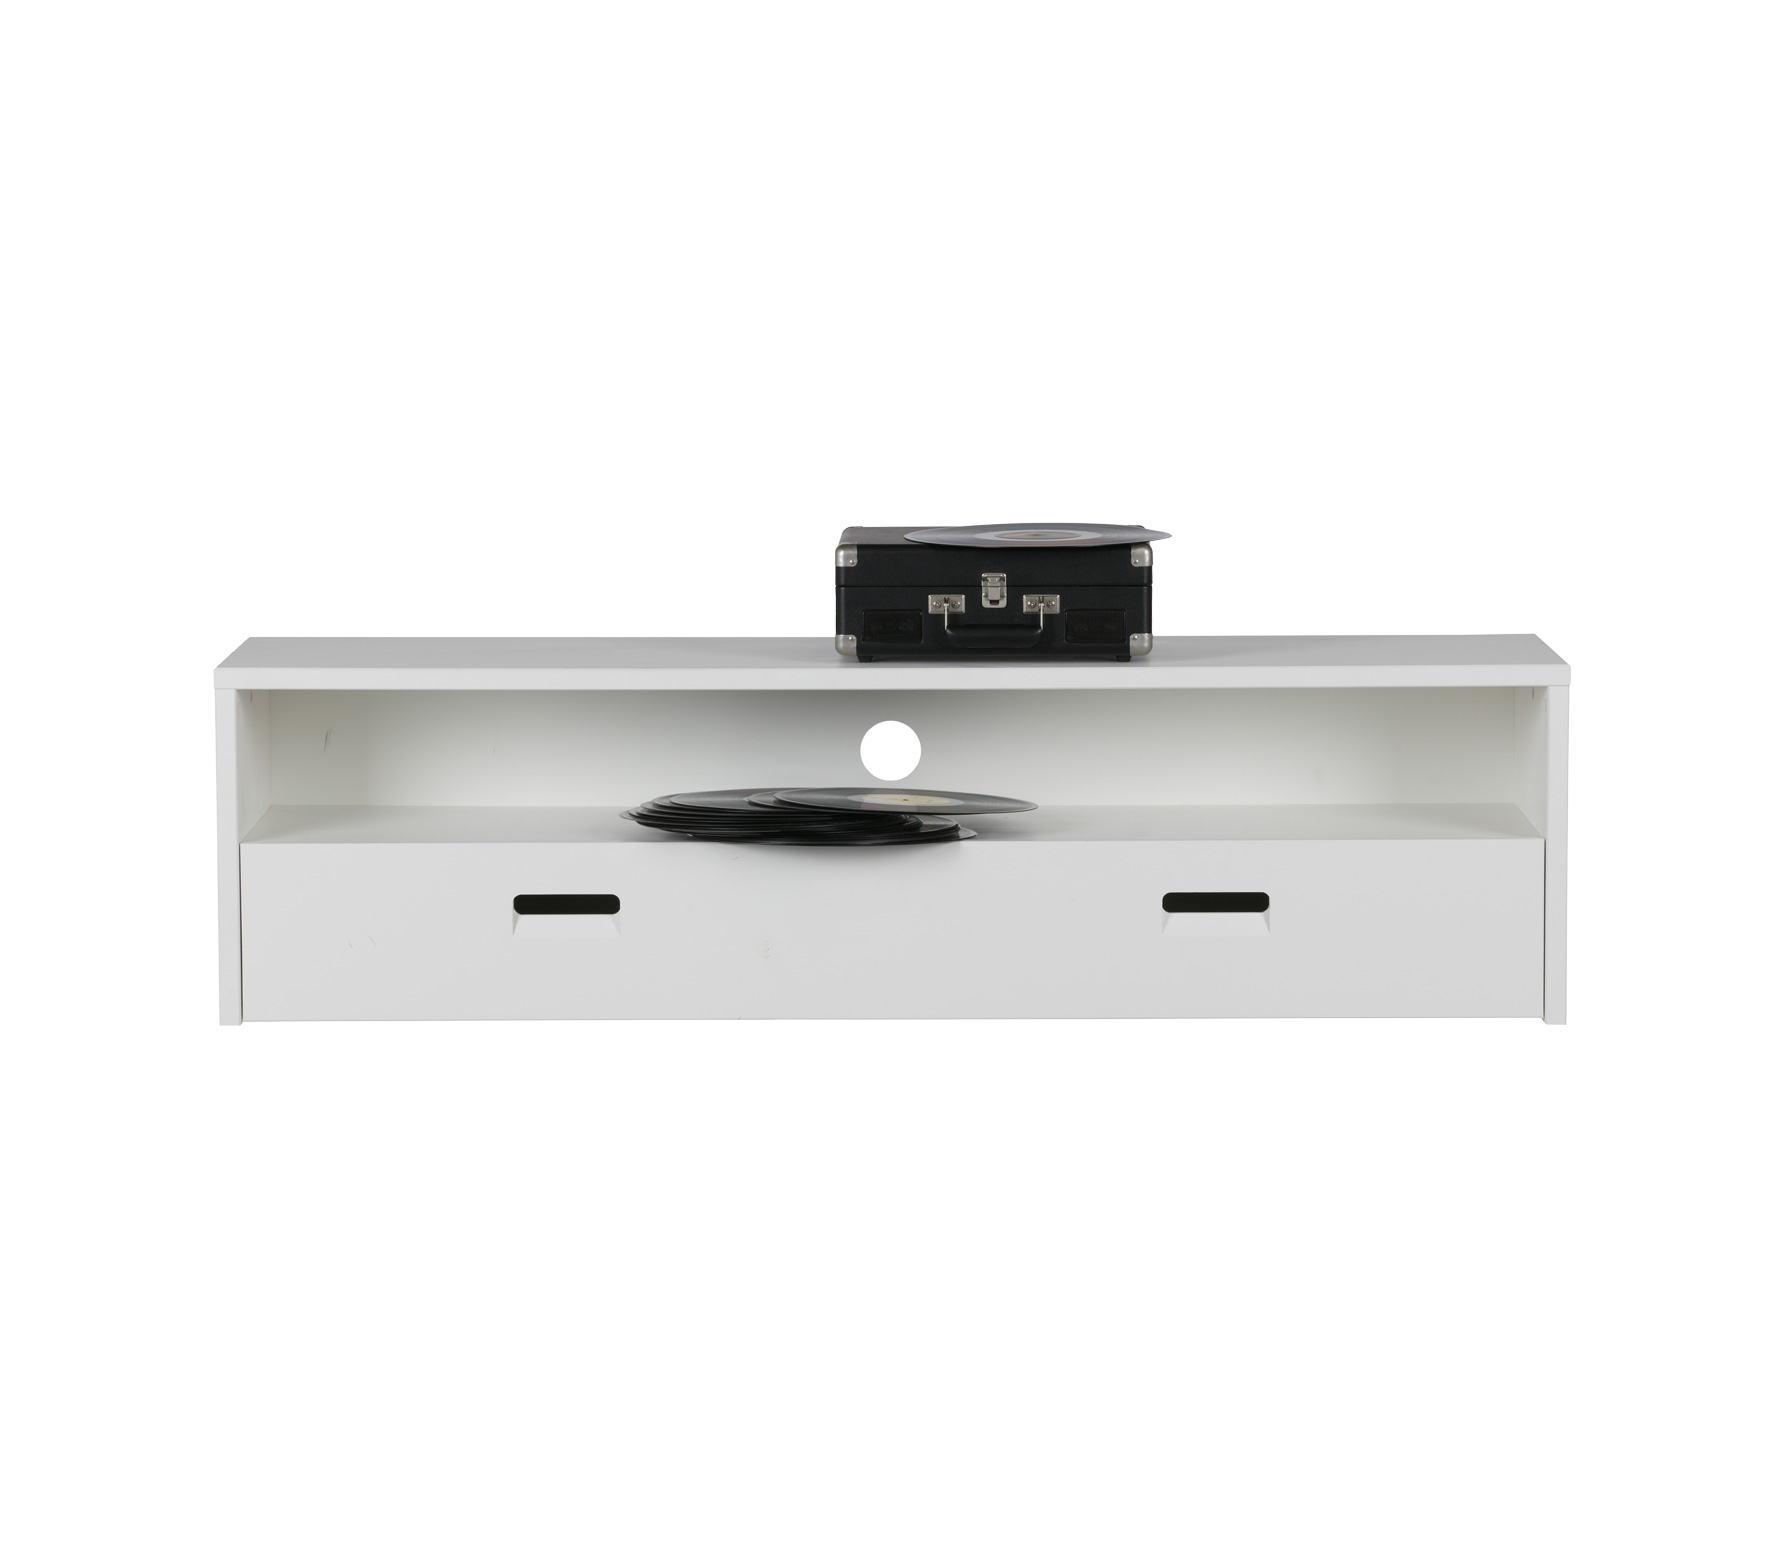 vtwonen Look at TV meubel 40x150x35 cm grenen wit gelakt Wit